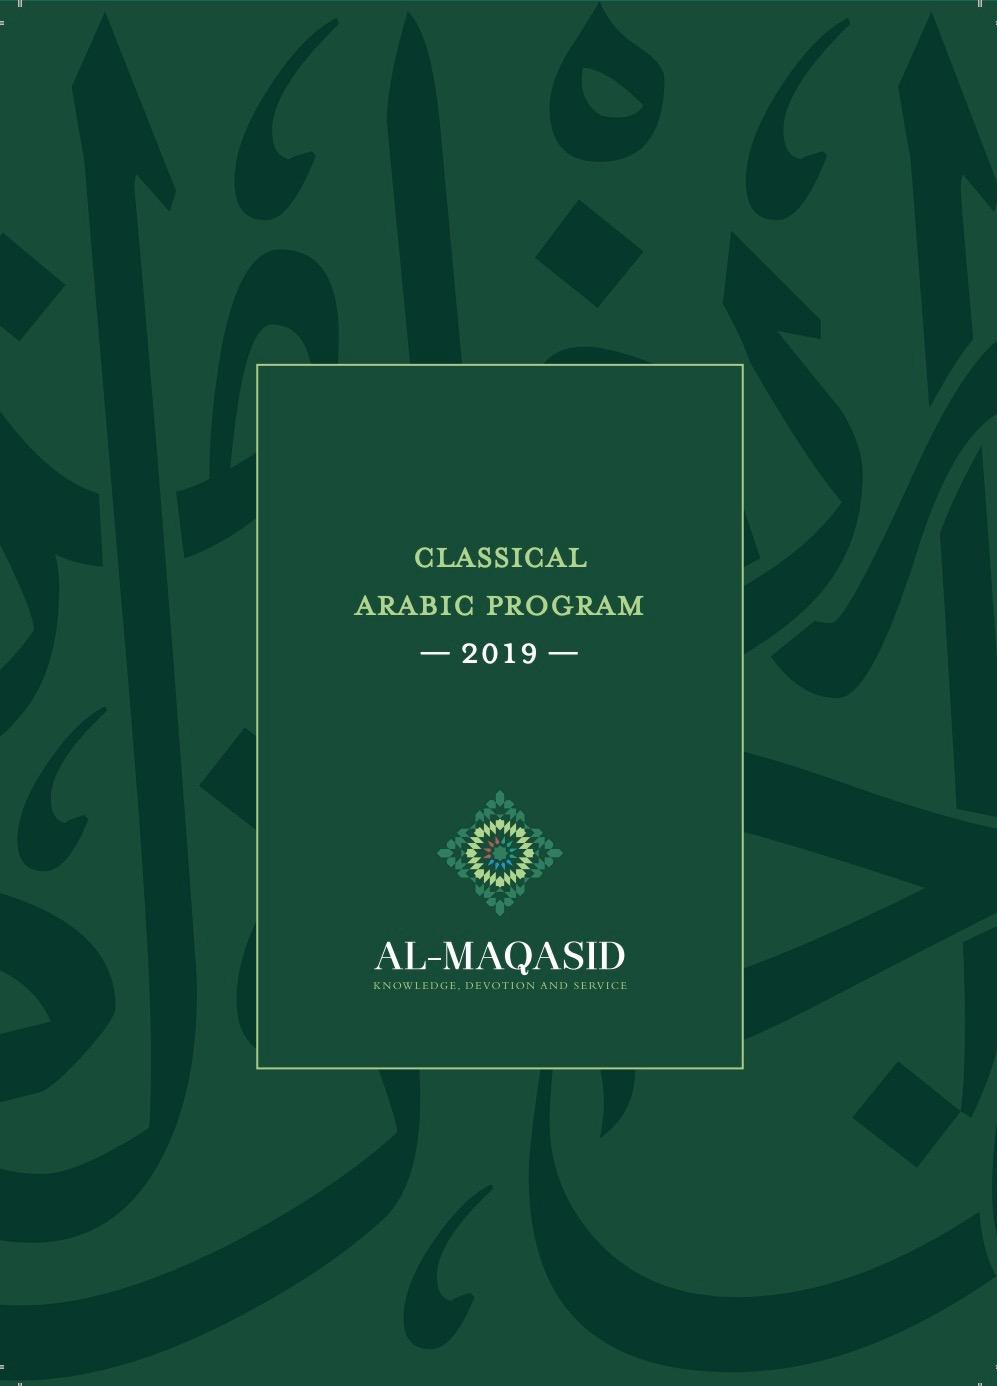 Arabic — Al-Maqasid